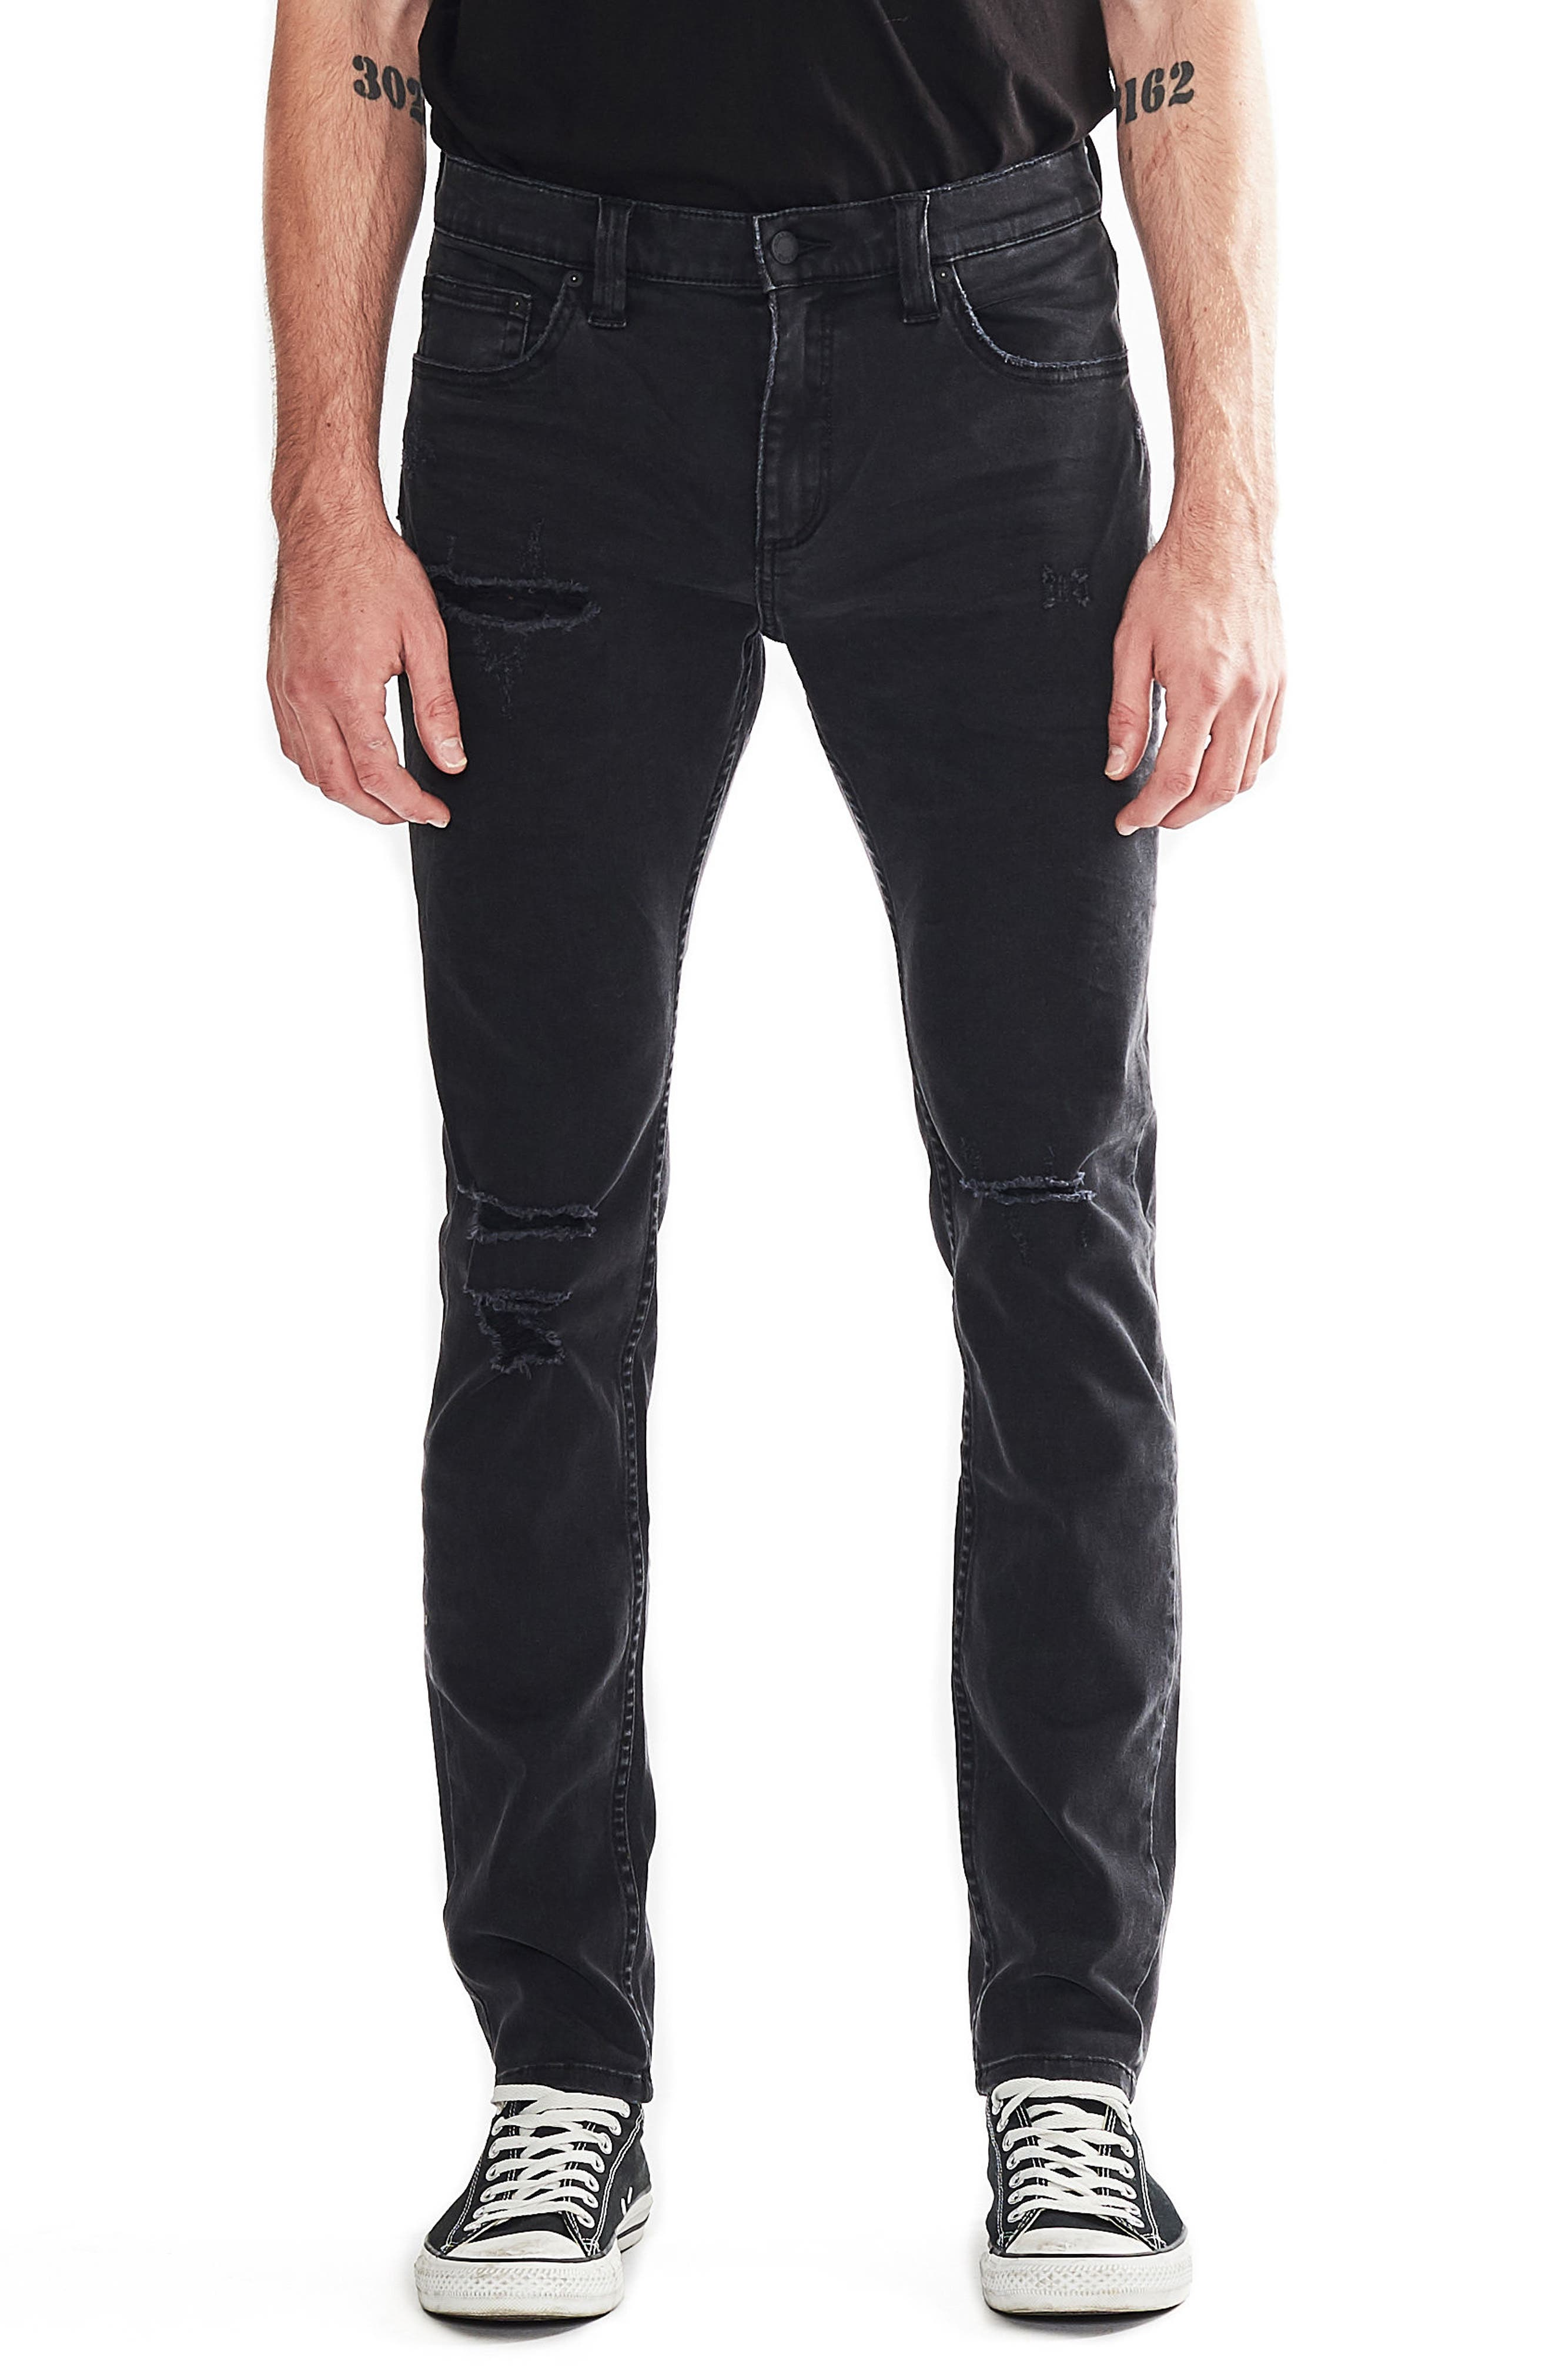 Stinger Skinny Fit Jeans,                         Main,                         color, BLOWOUT BLACK